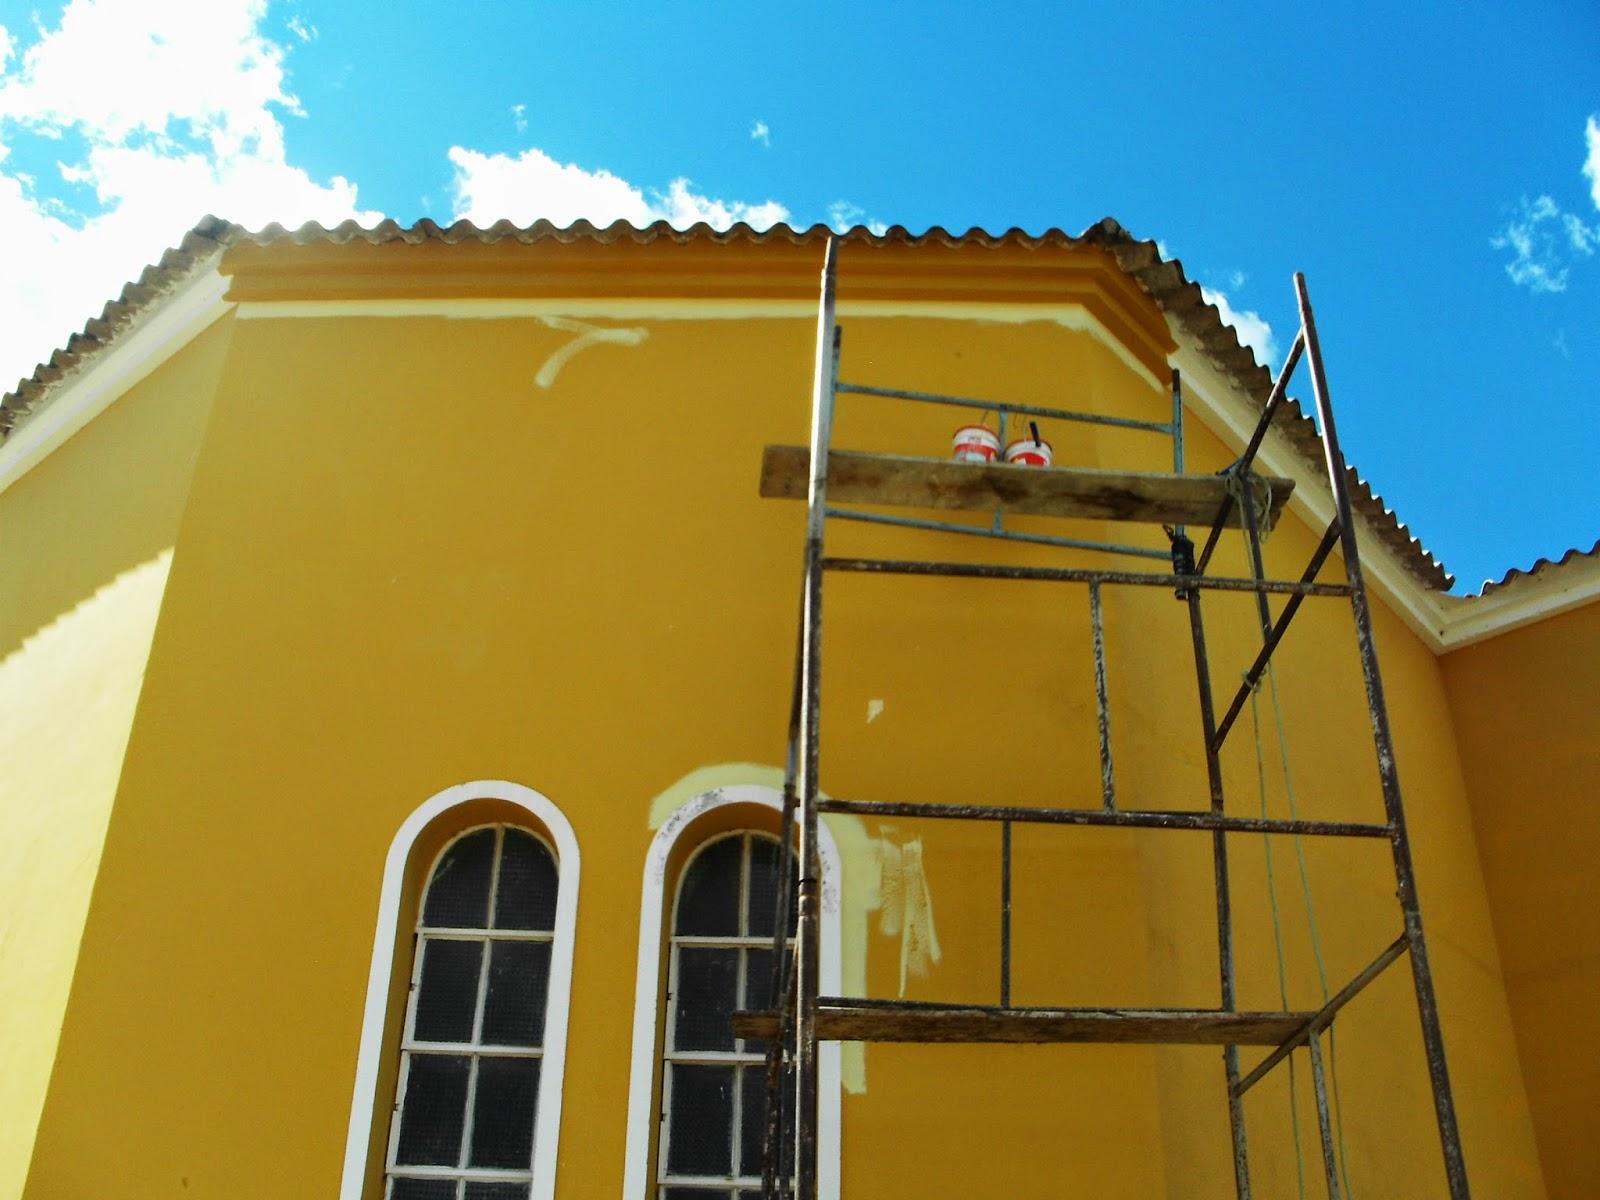 Igreja Matriz em Almino Afonso passa por reformas